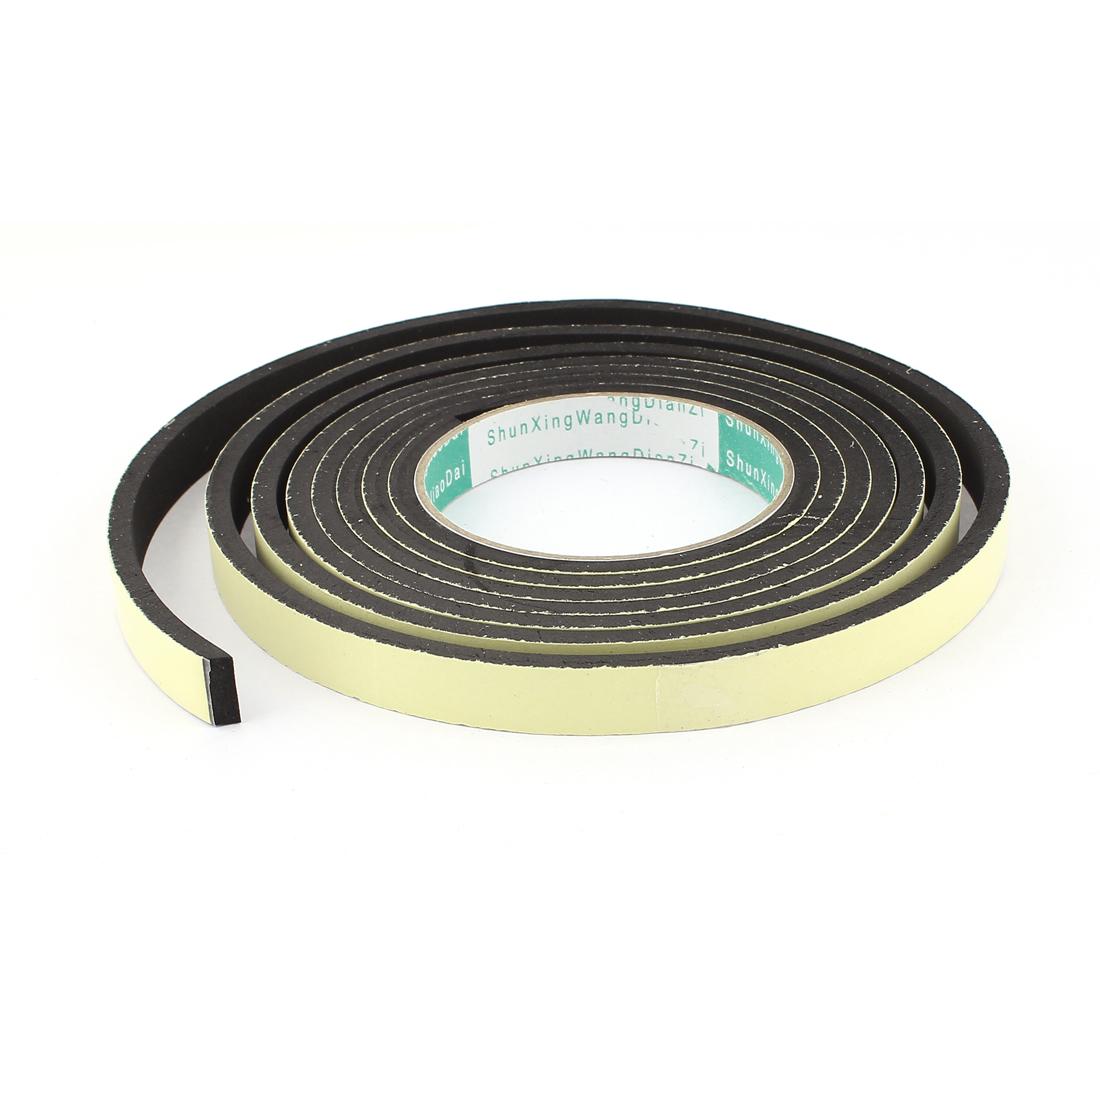 3 Meter 15mm x 5mm Single Side Adhesive Foam Sealing Tape for Door Window